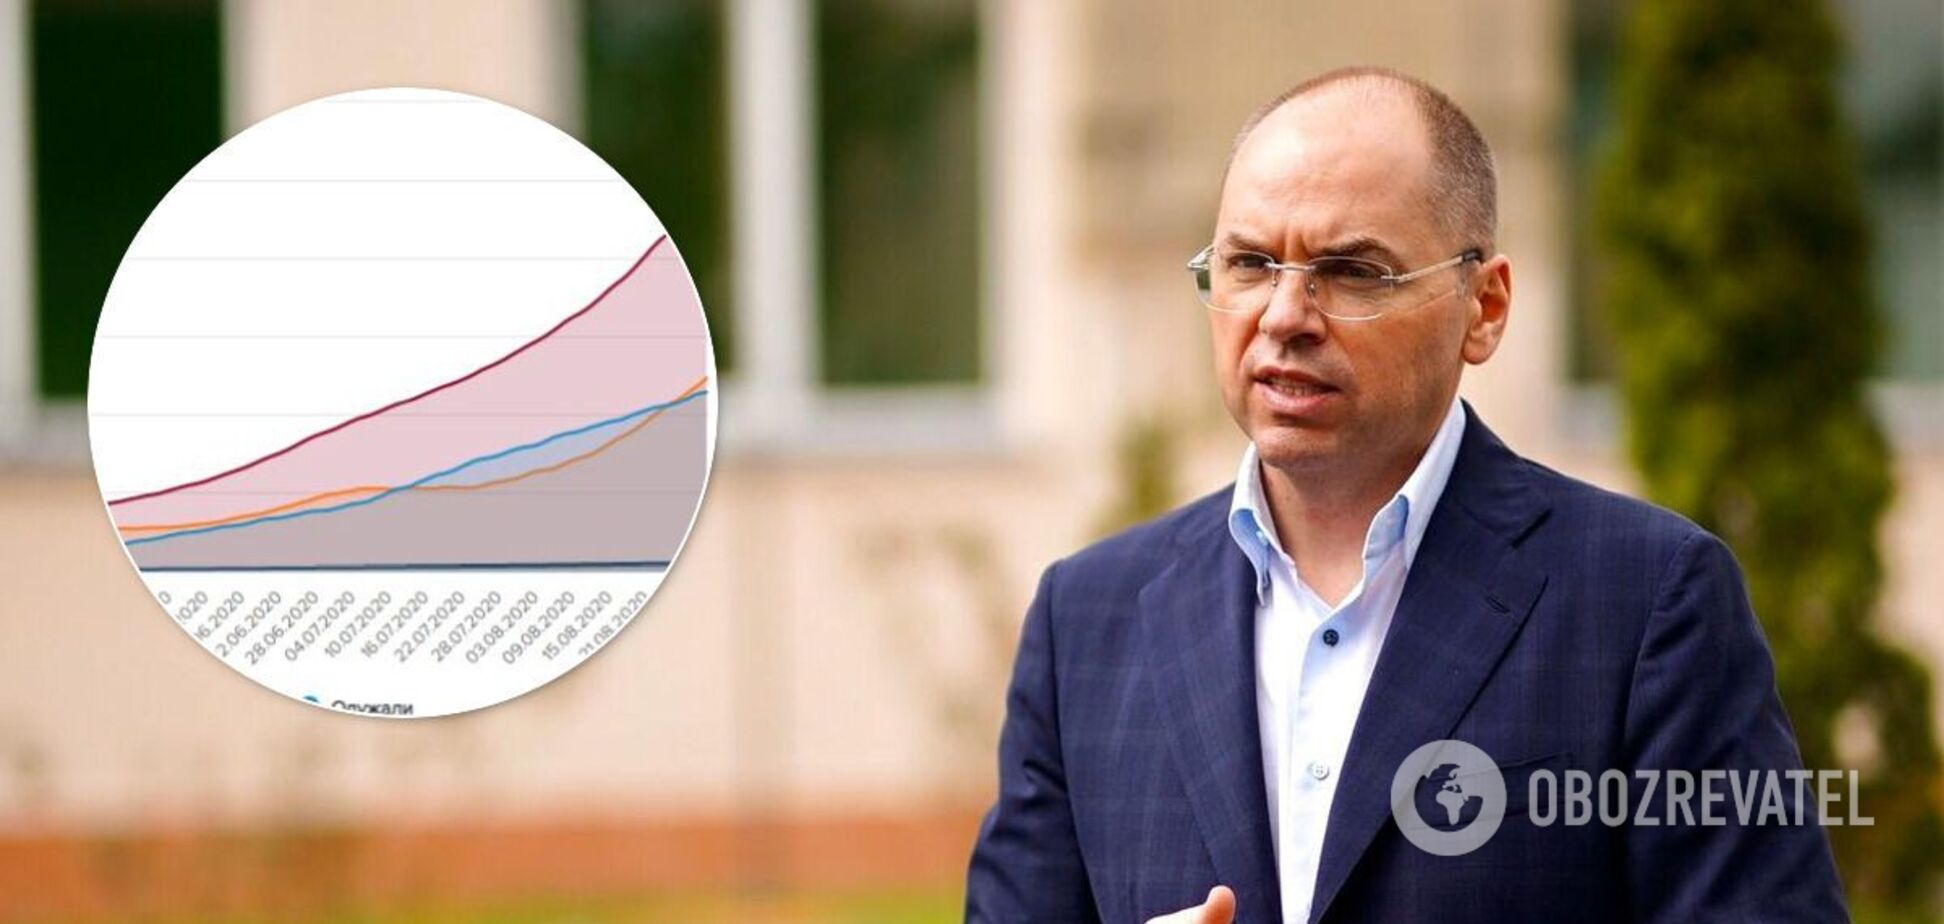 Глава Минздрава озвучил недельную статистику по коронавирусу